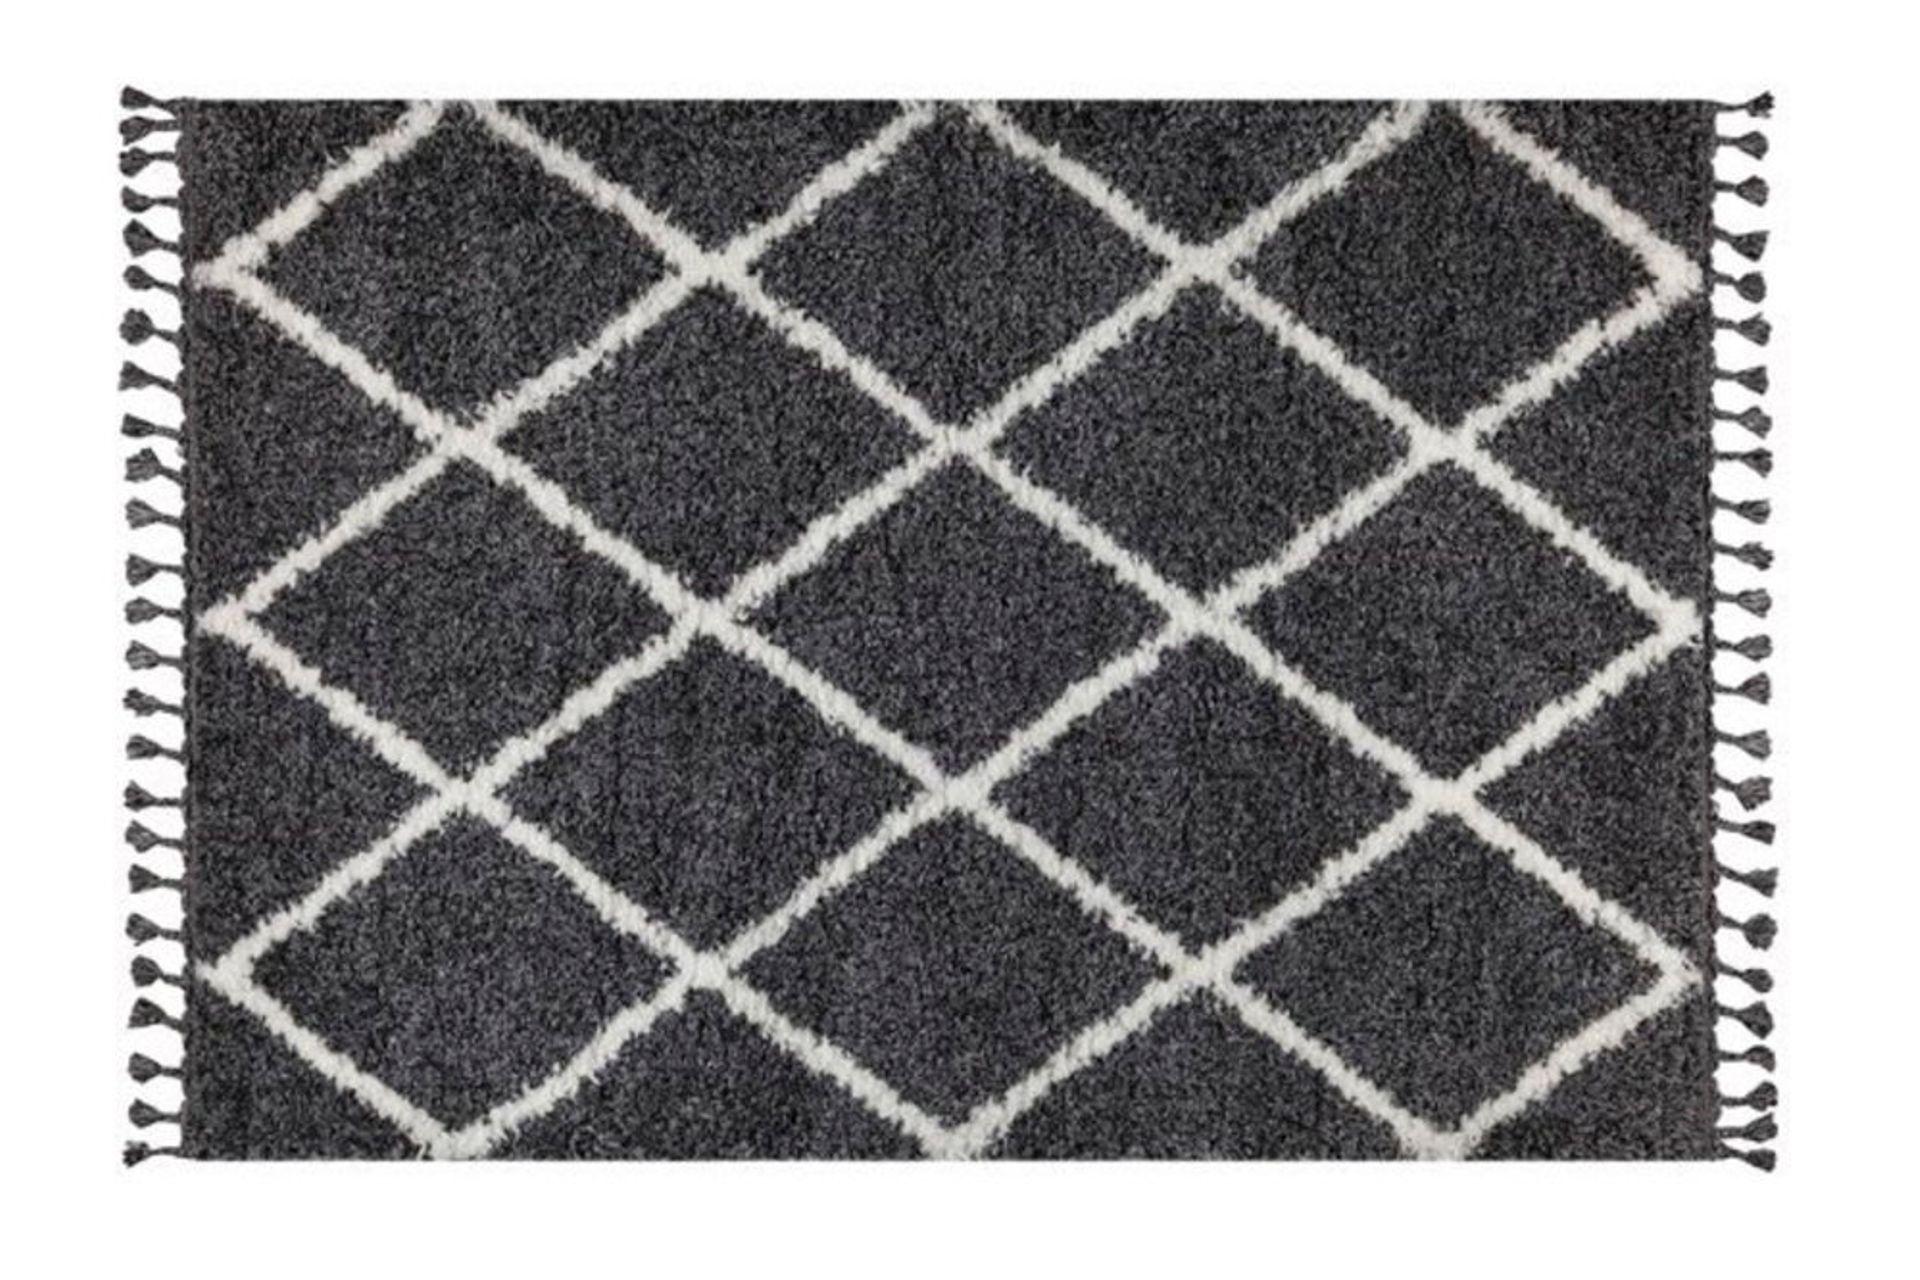 Marrakesh Line Rug, Anthracite Grey & White (Medium)